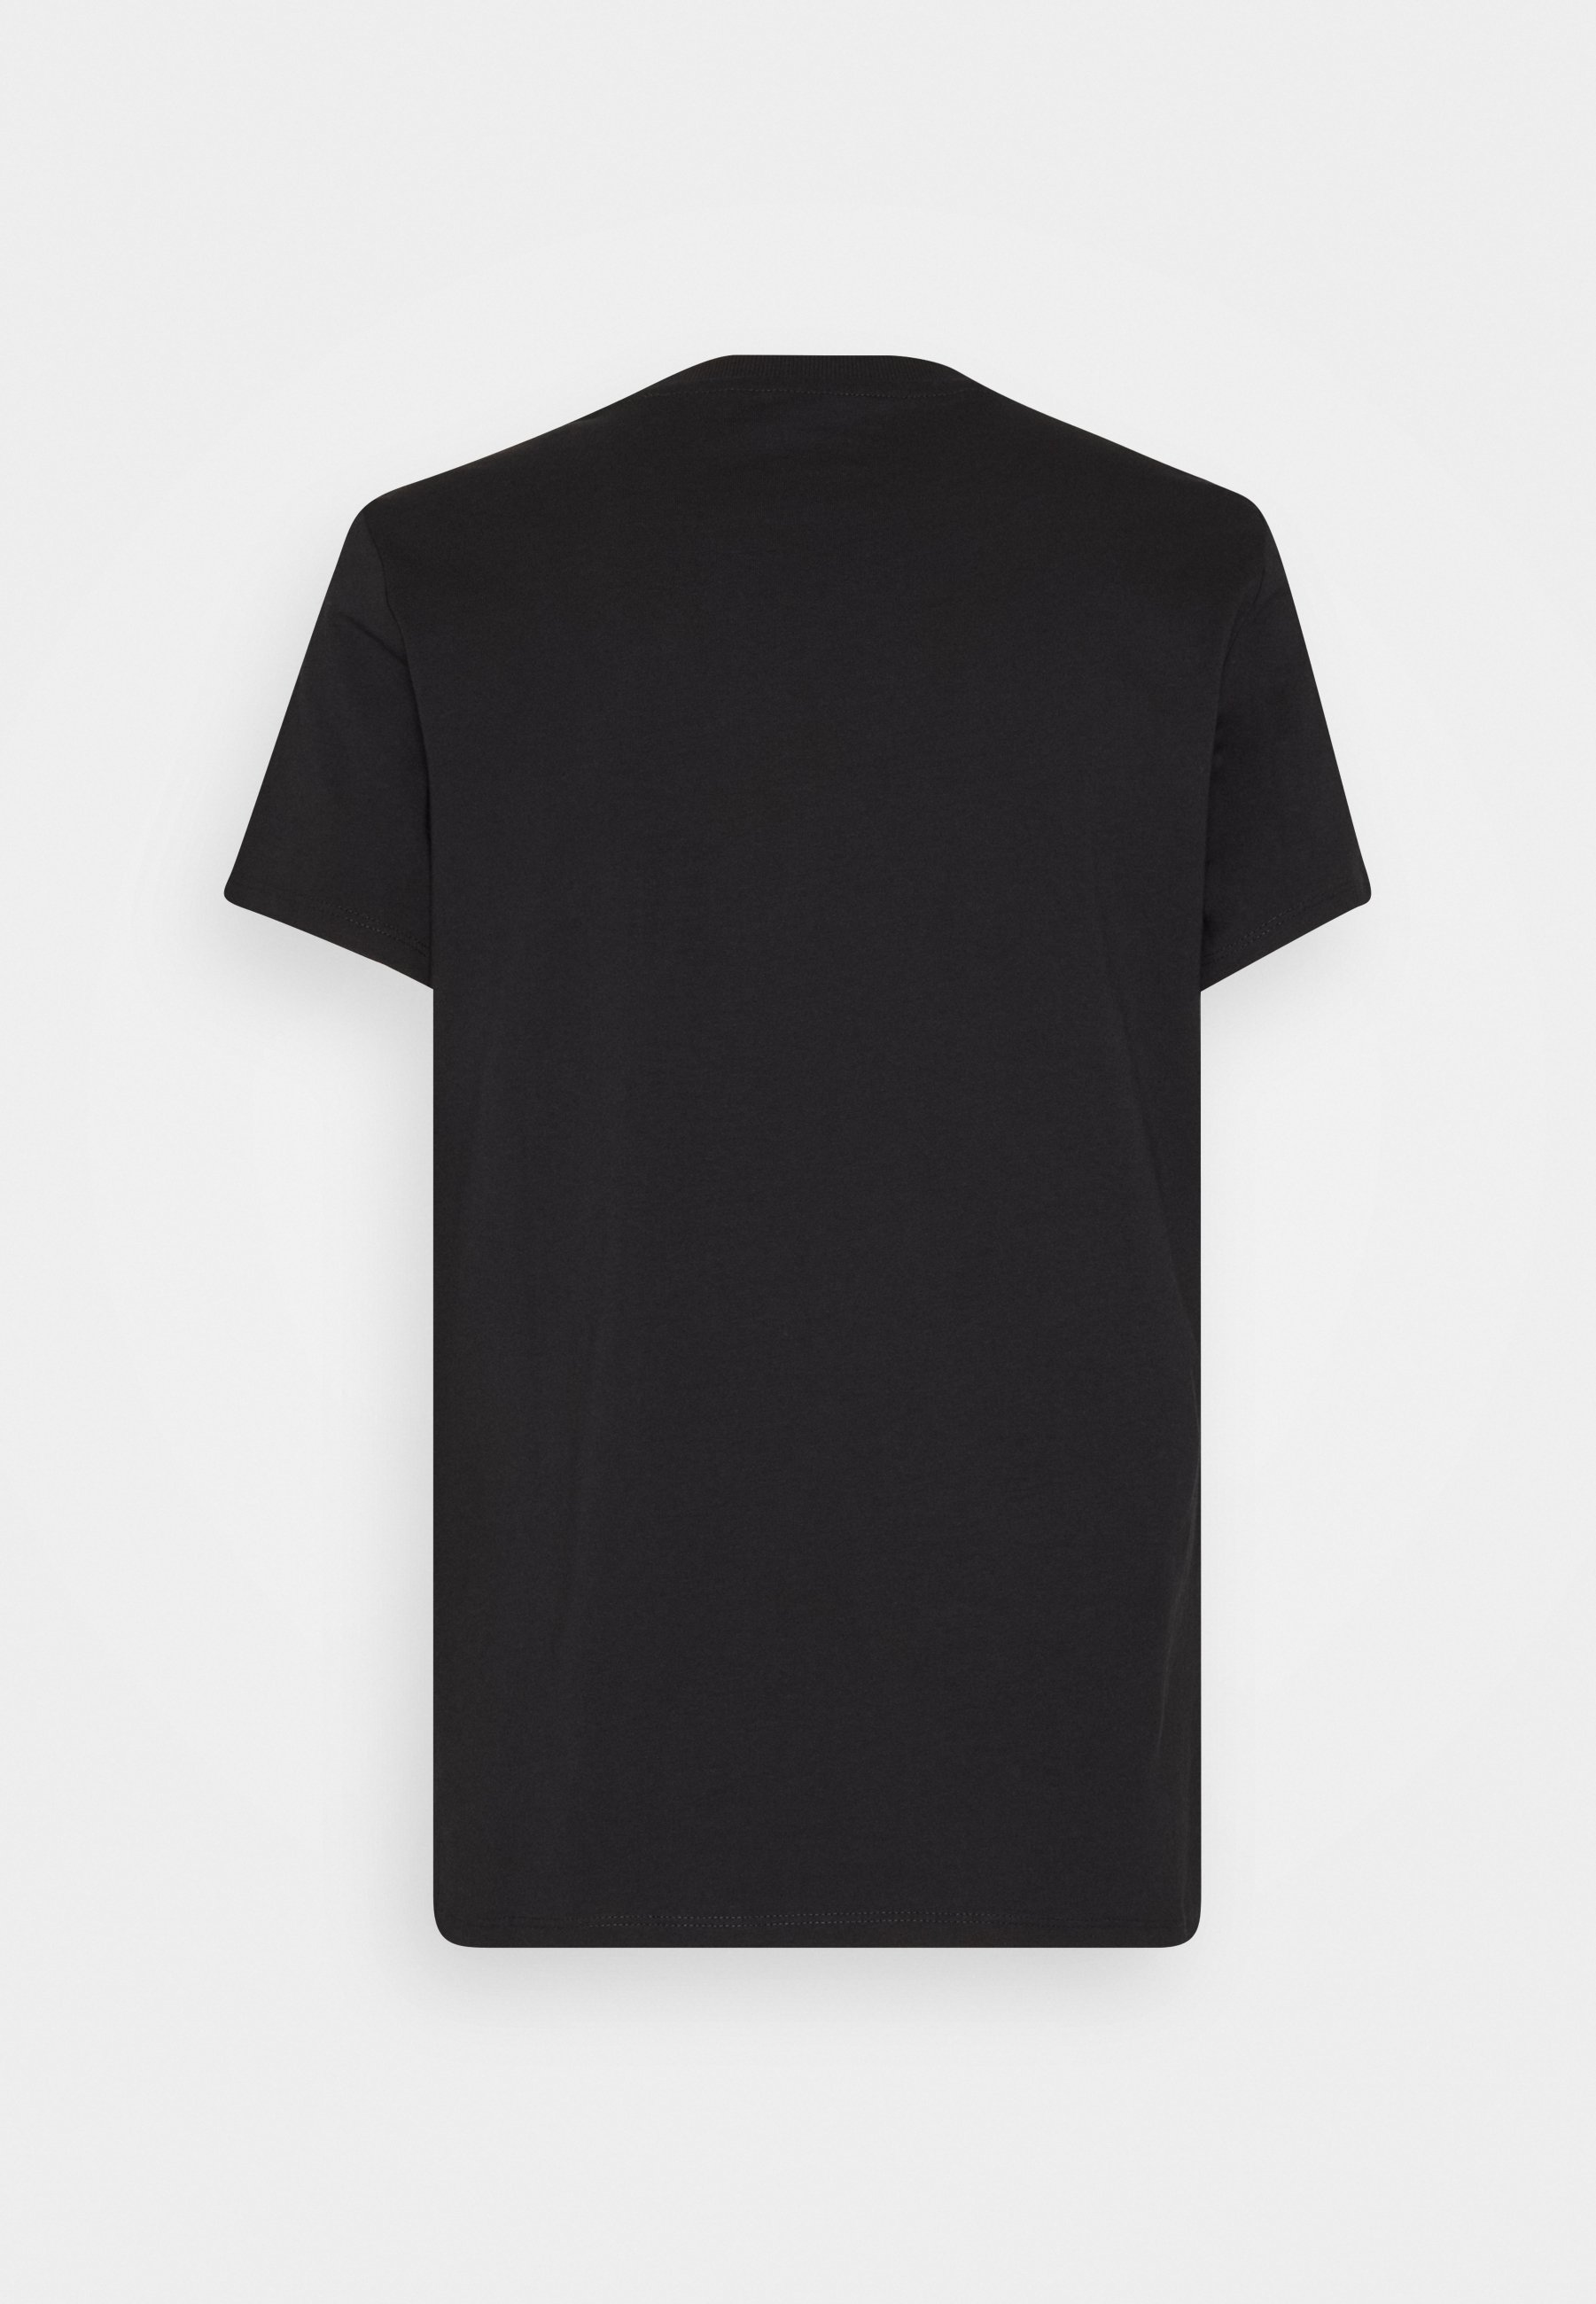 Esprit Core - T-shirts Med Print Black/svart